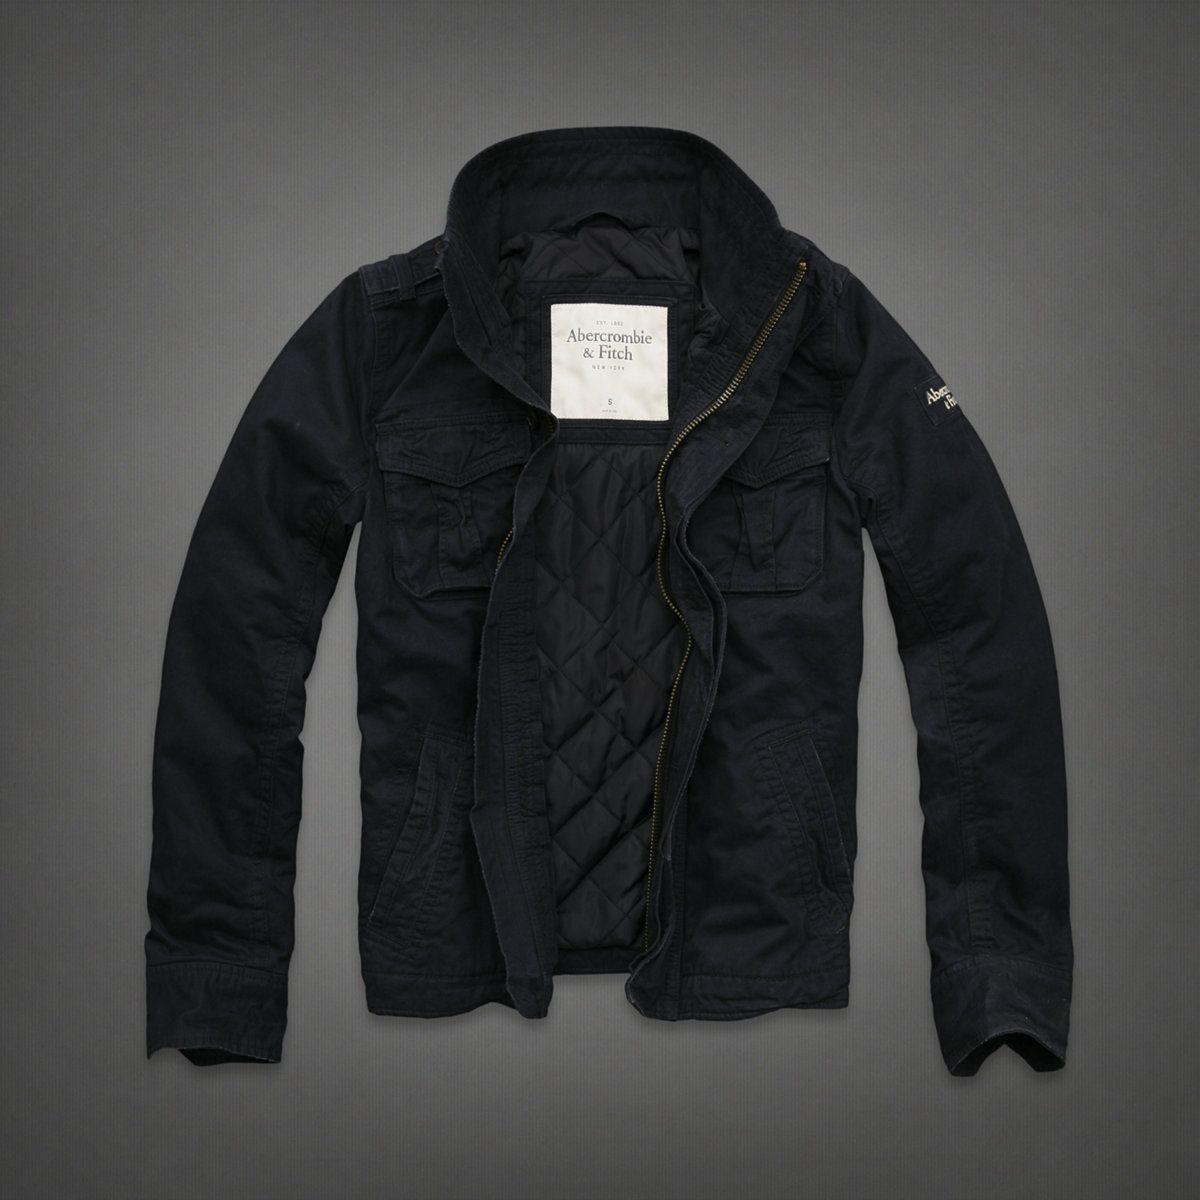 A Goodnow mountain jacket S | damesjassen in 2019 | Military style